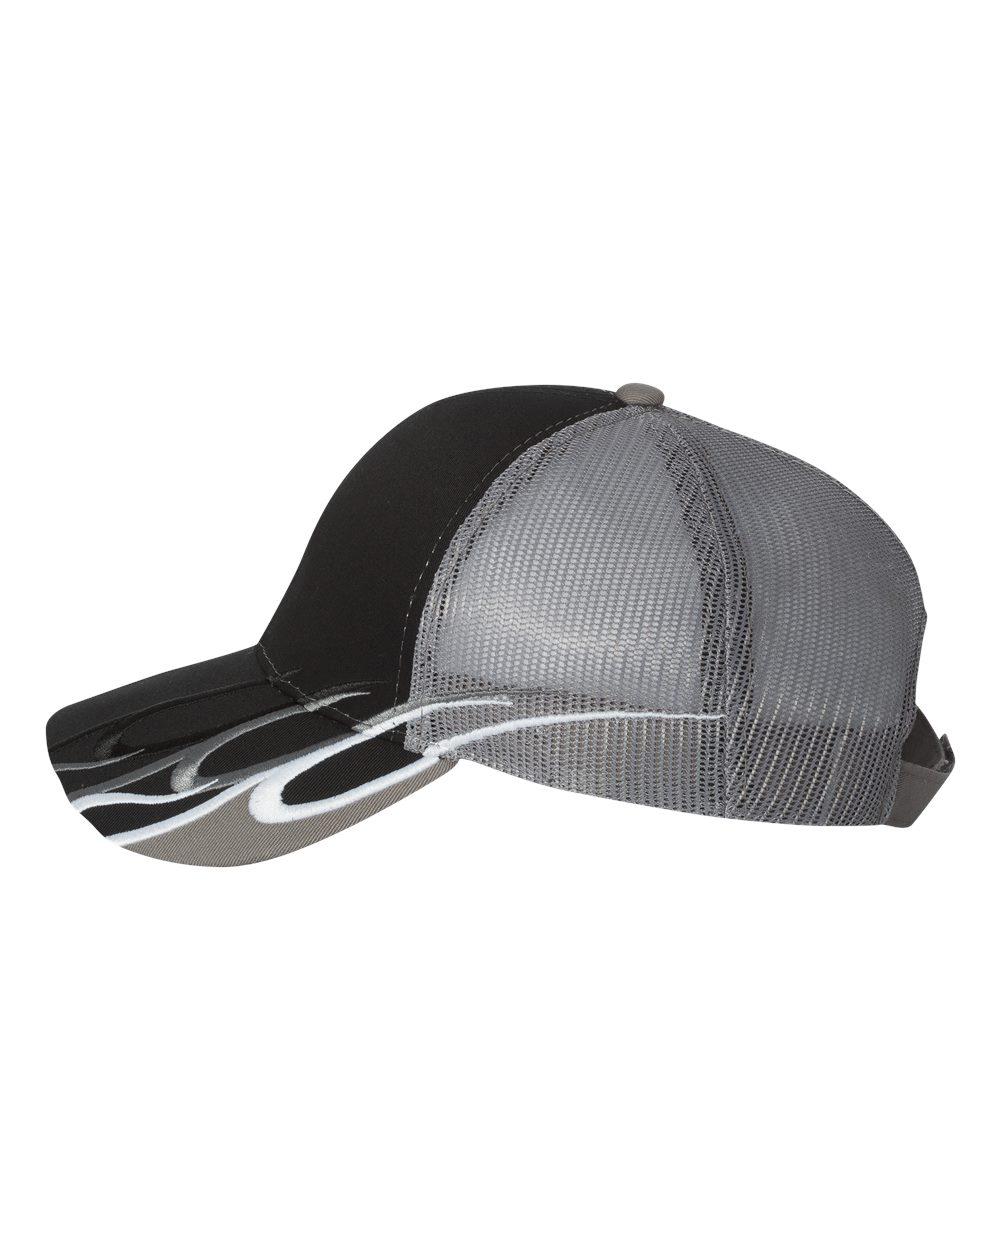 Outdoor Cap WAV605M - Flame Mesh Back Cap